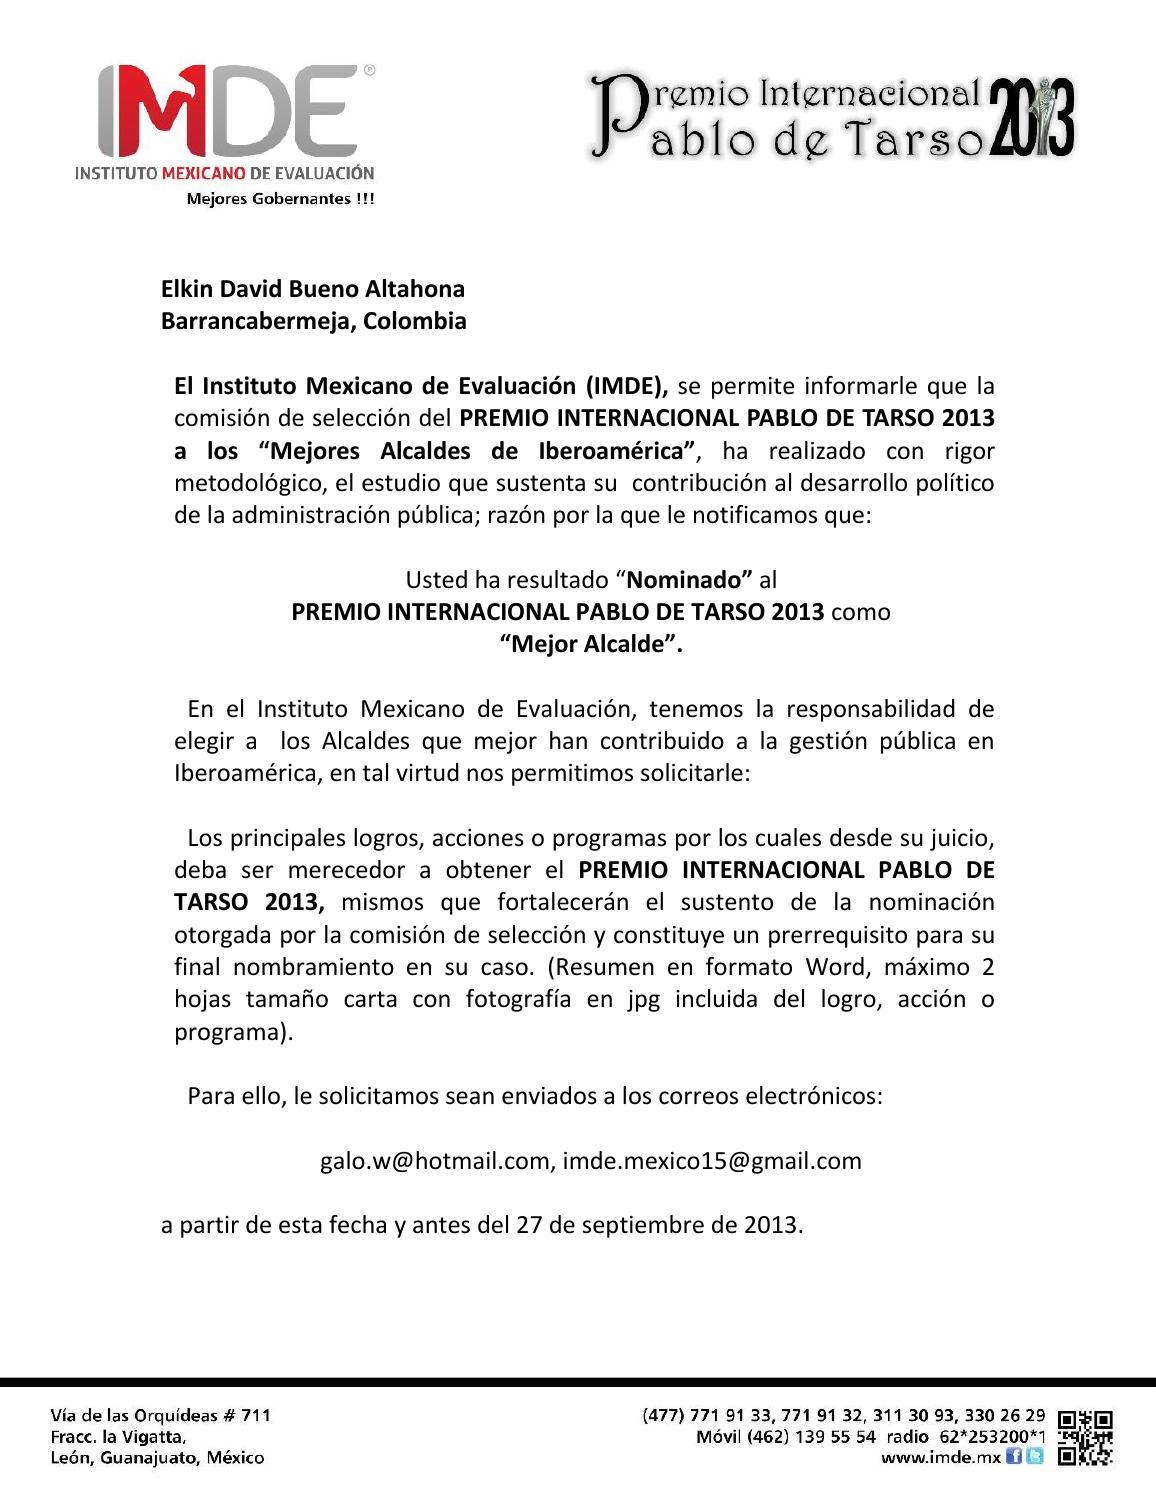 Documento nominacion premio internacional pablo de tarso 2013 by ...